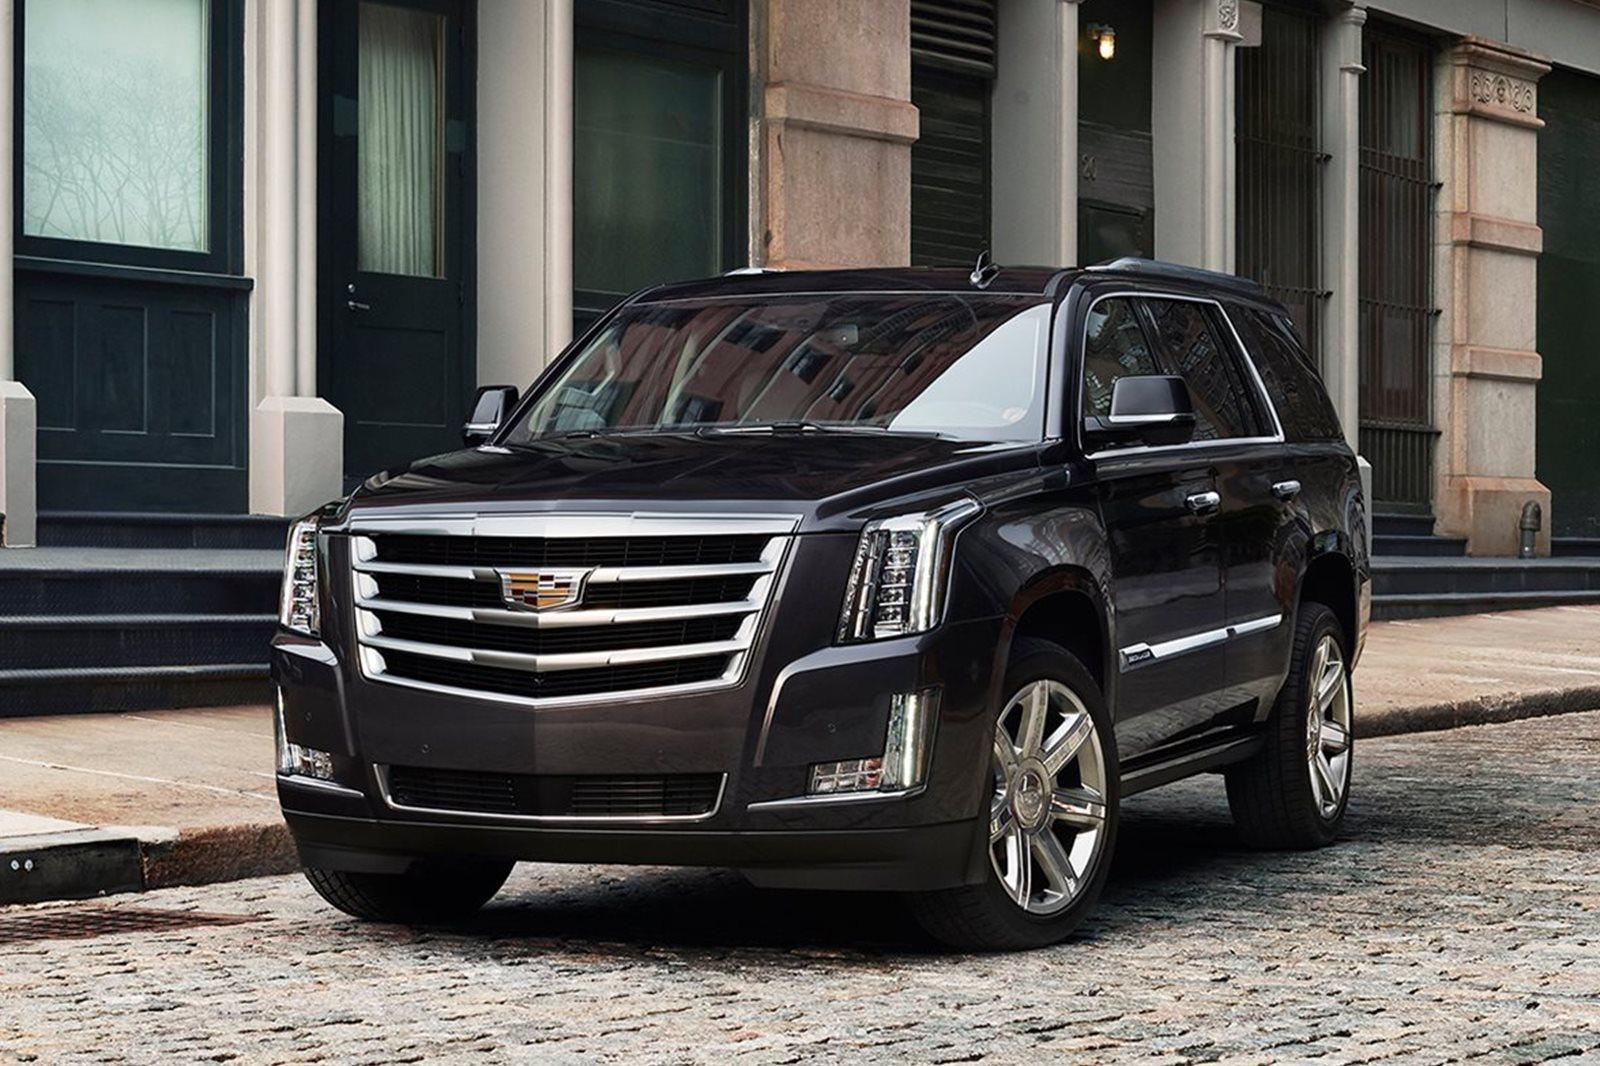 2018 Cadillac Escalade ESV Review, Trims, Specs and Price - CarBuzz